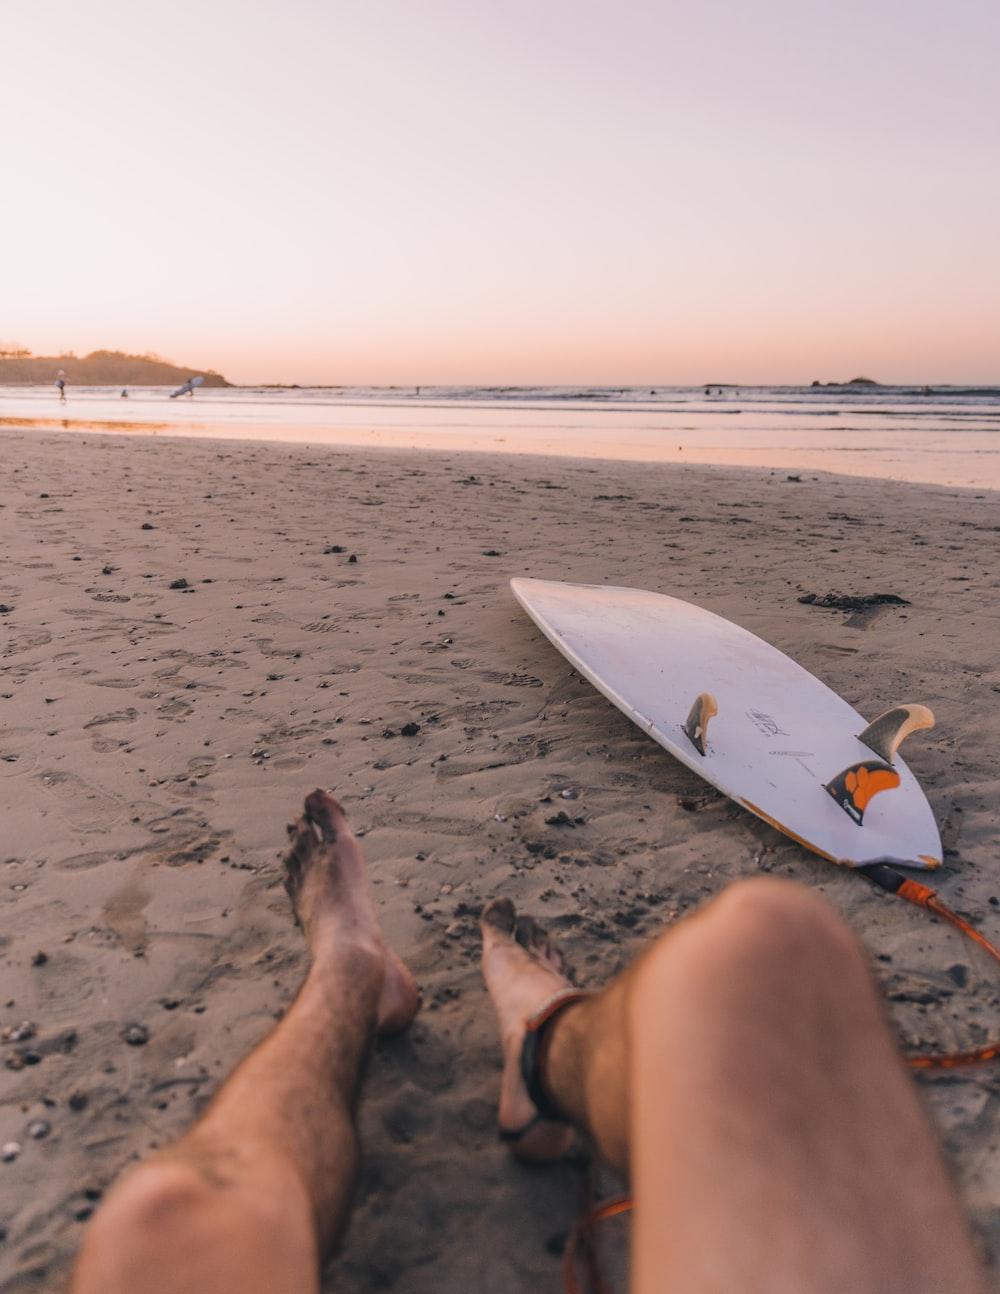 person sitting on seashore near surfboard in front sea